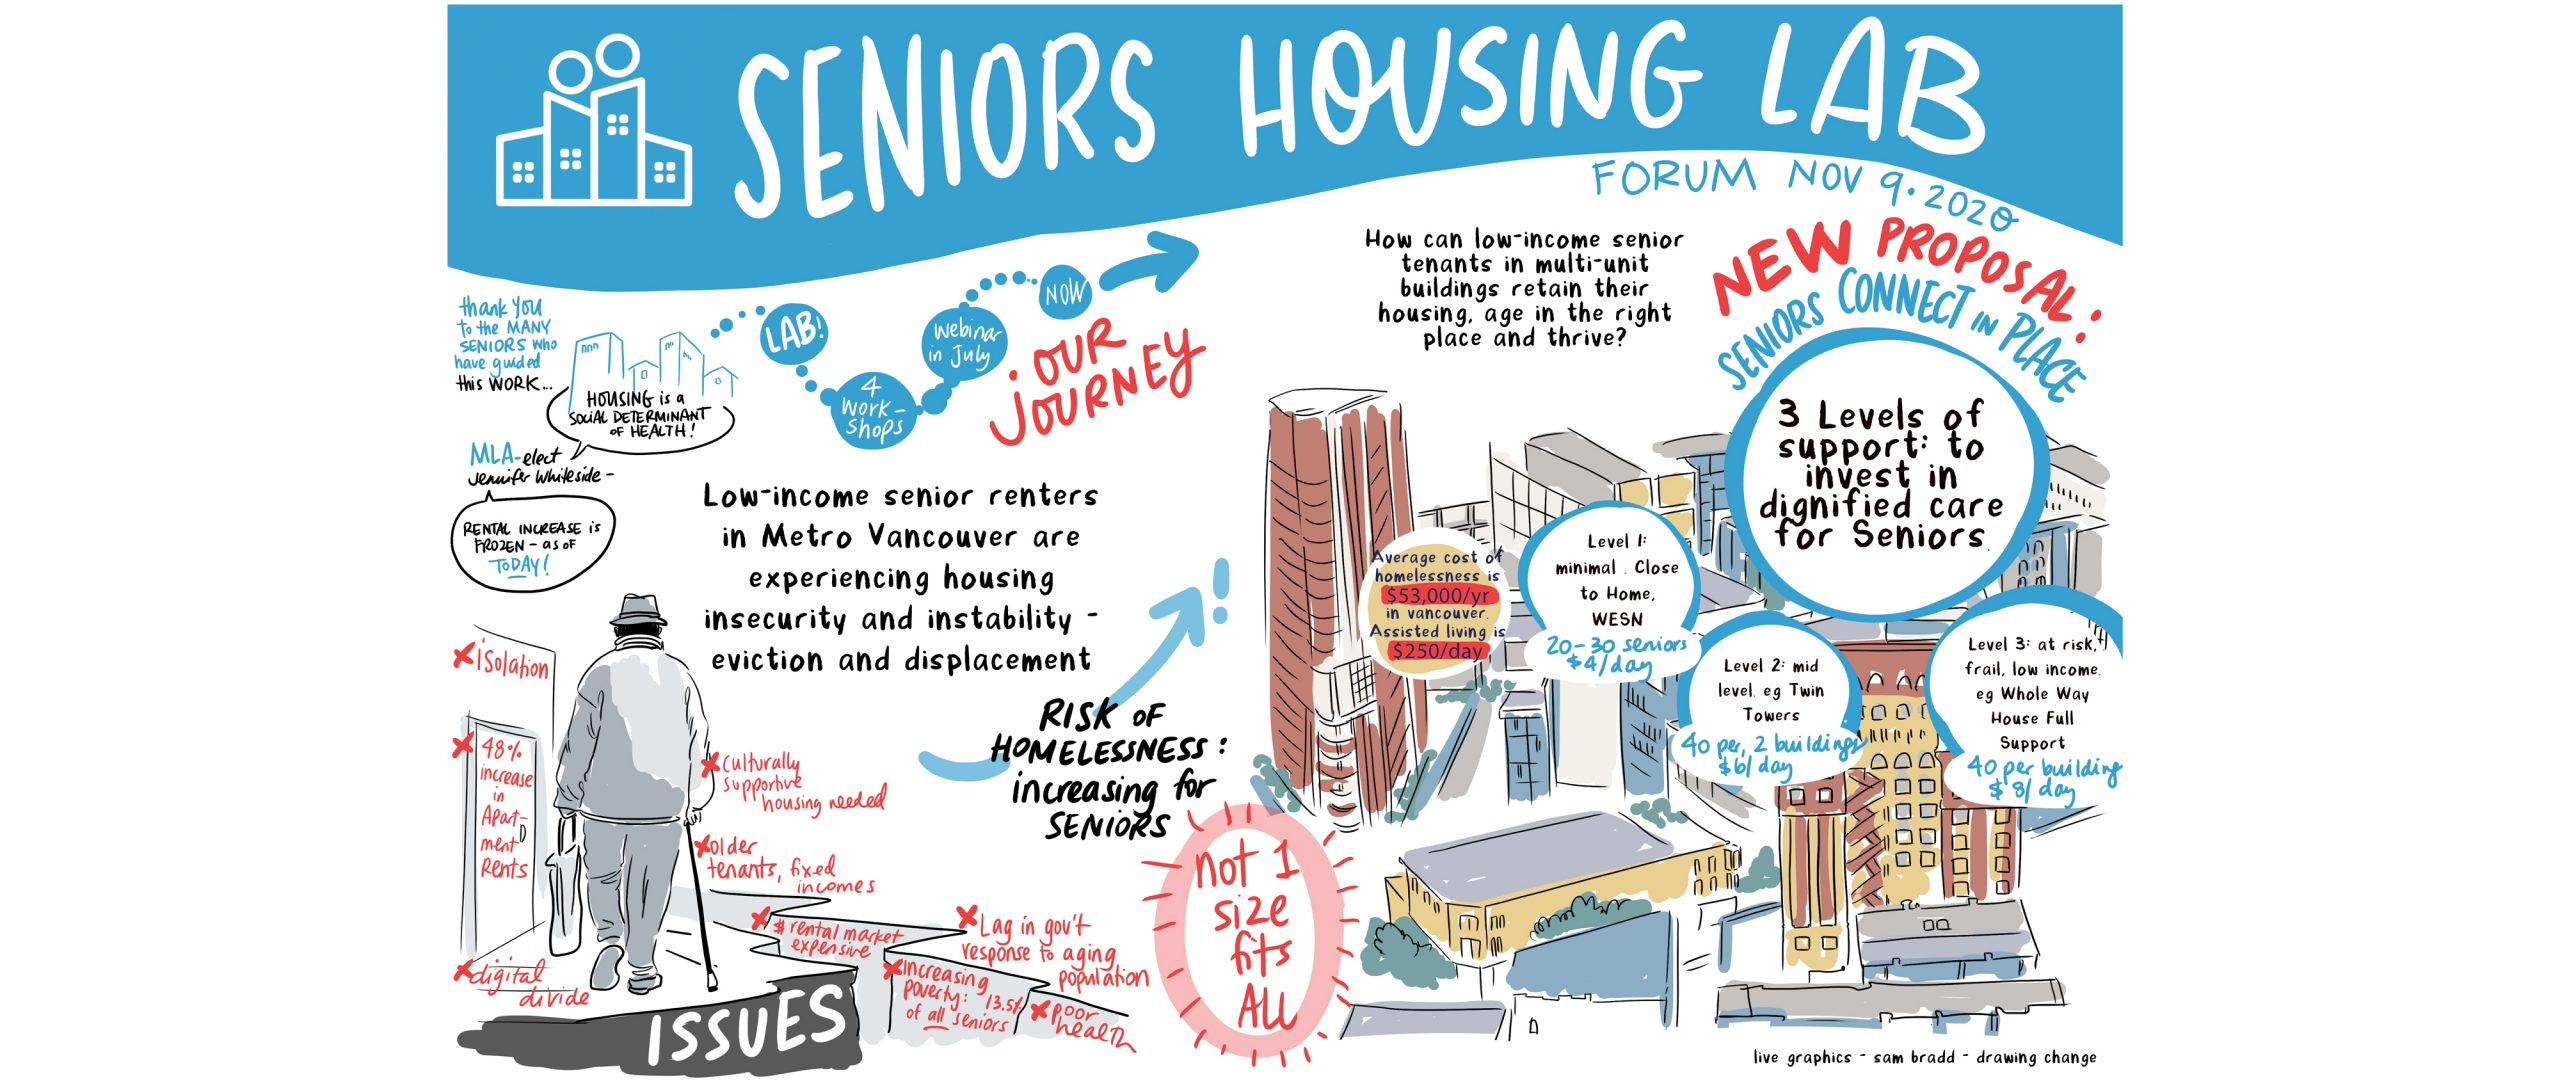 graphic recording sam bradd drawing change seniors housing lab